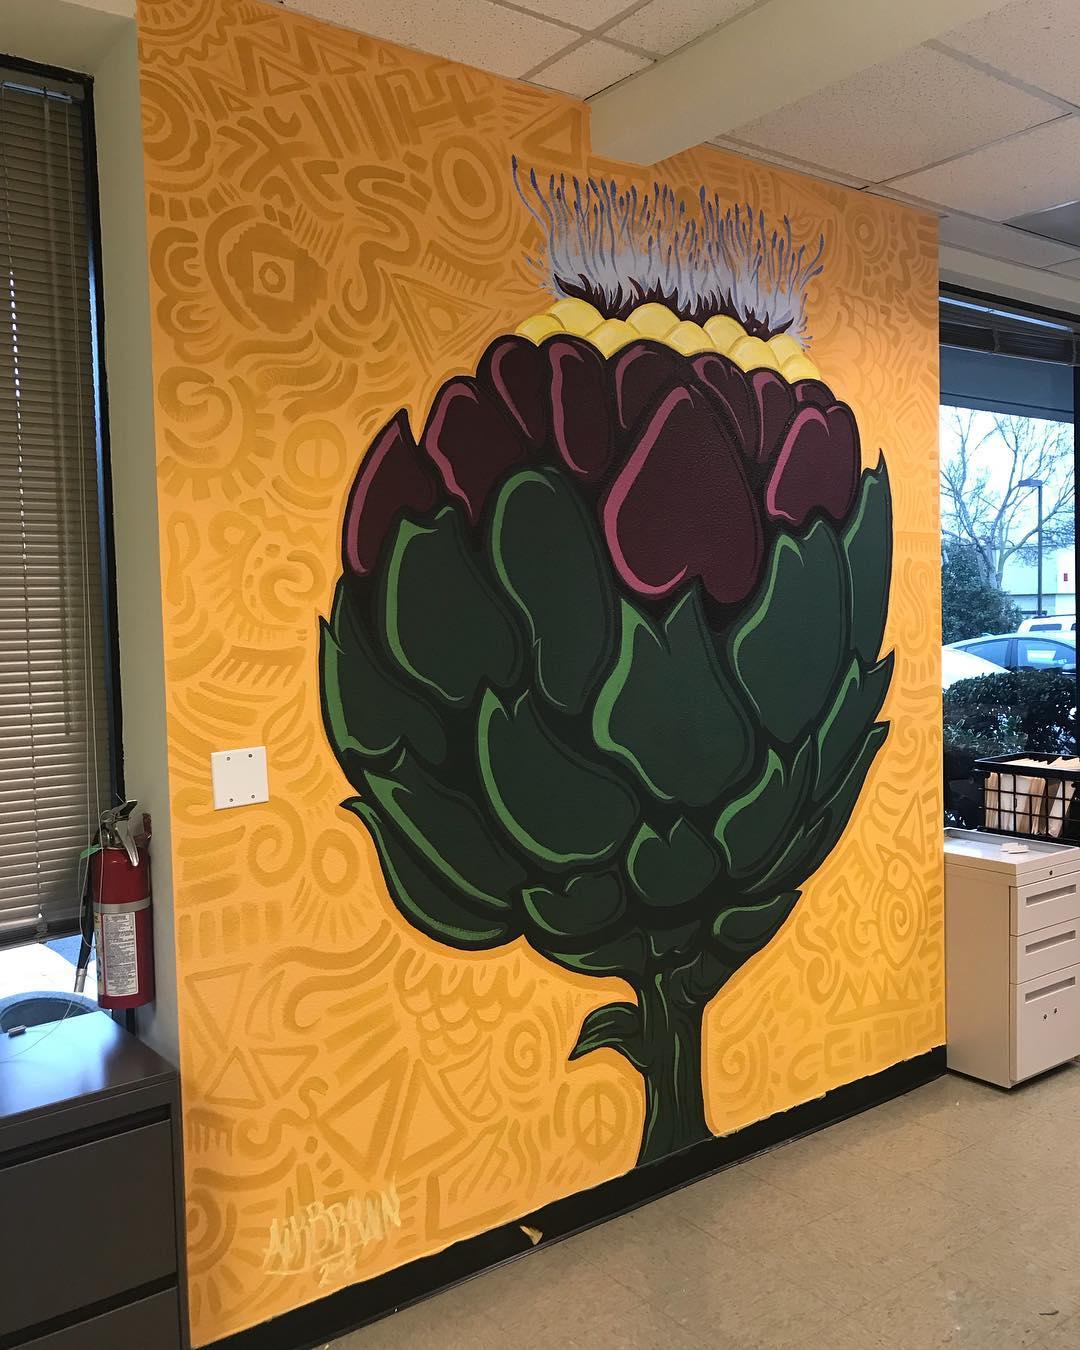 The Artichoke Flower, 8.25' x 8.75' Acrylics on Orange Peel Textured Wall, 2018.jpg